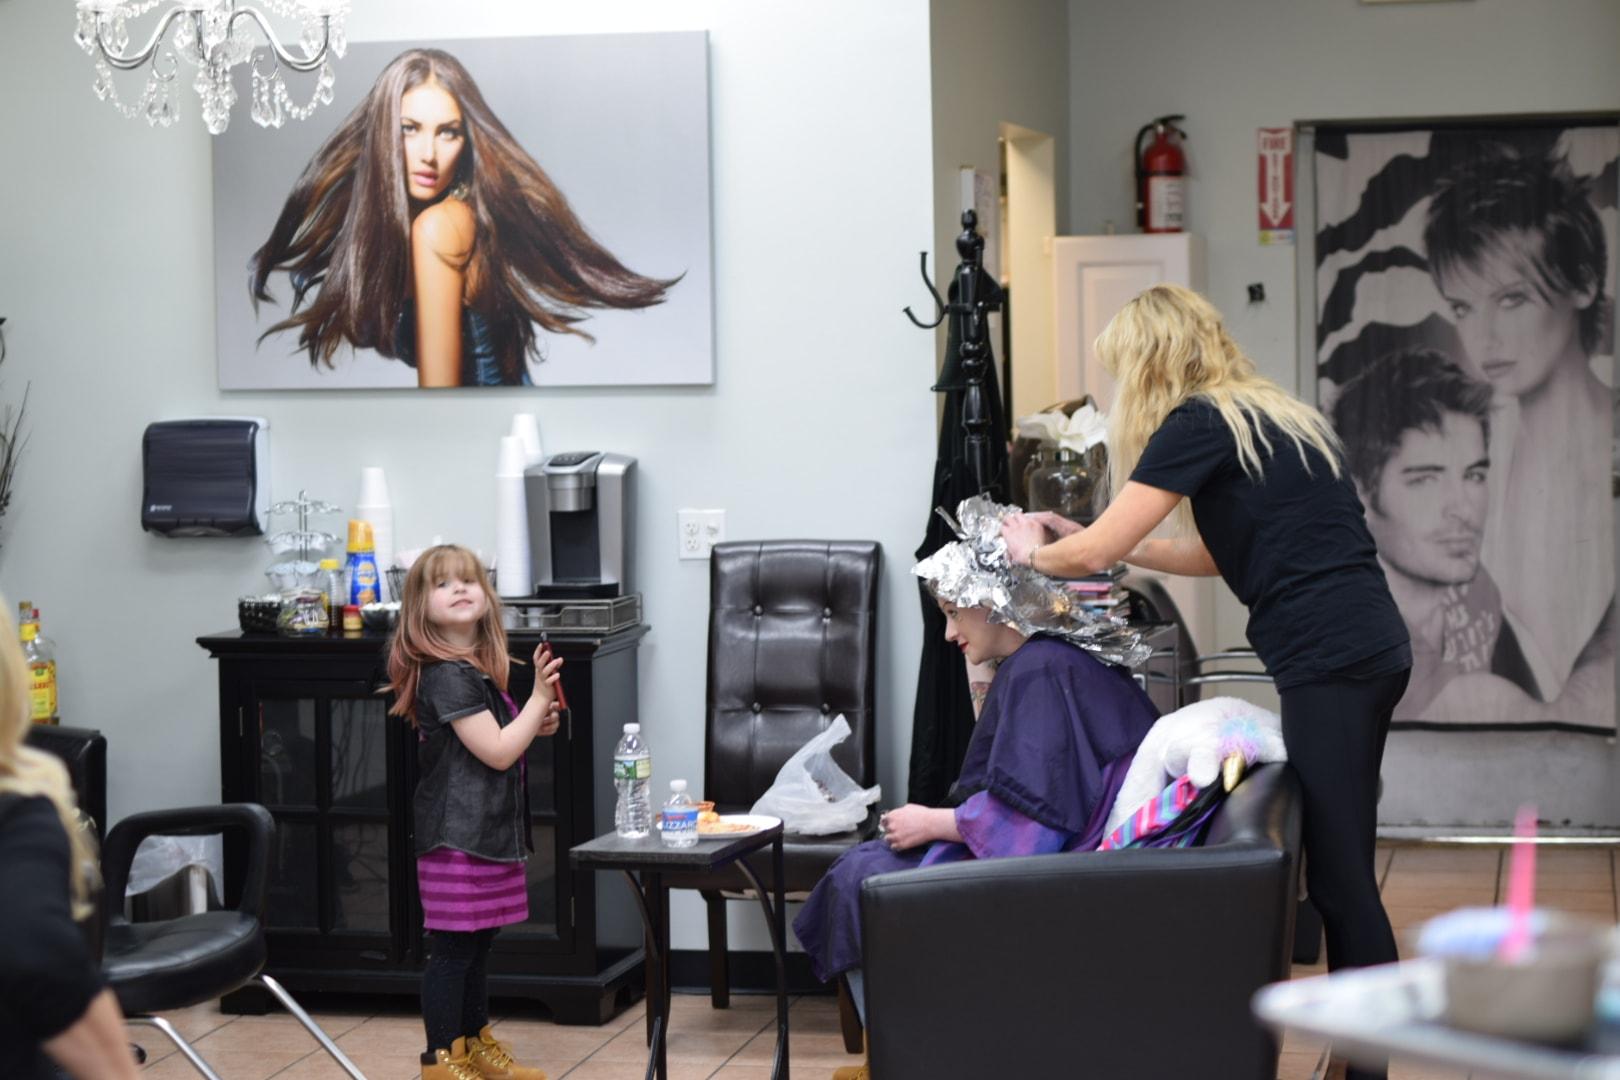 Phily's Cuts, haircare, hair, Brick NJ, Salon, Foils